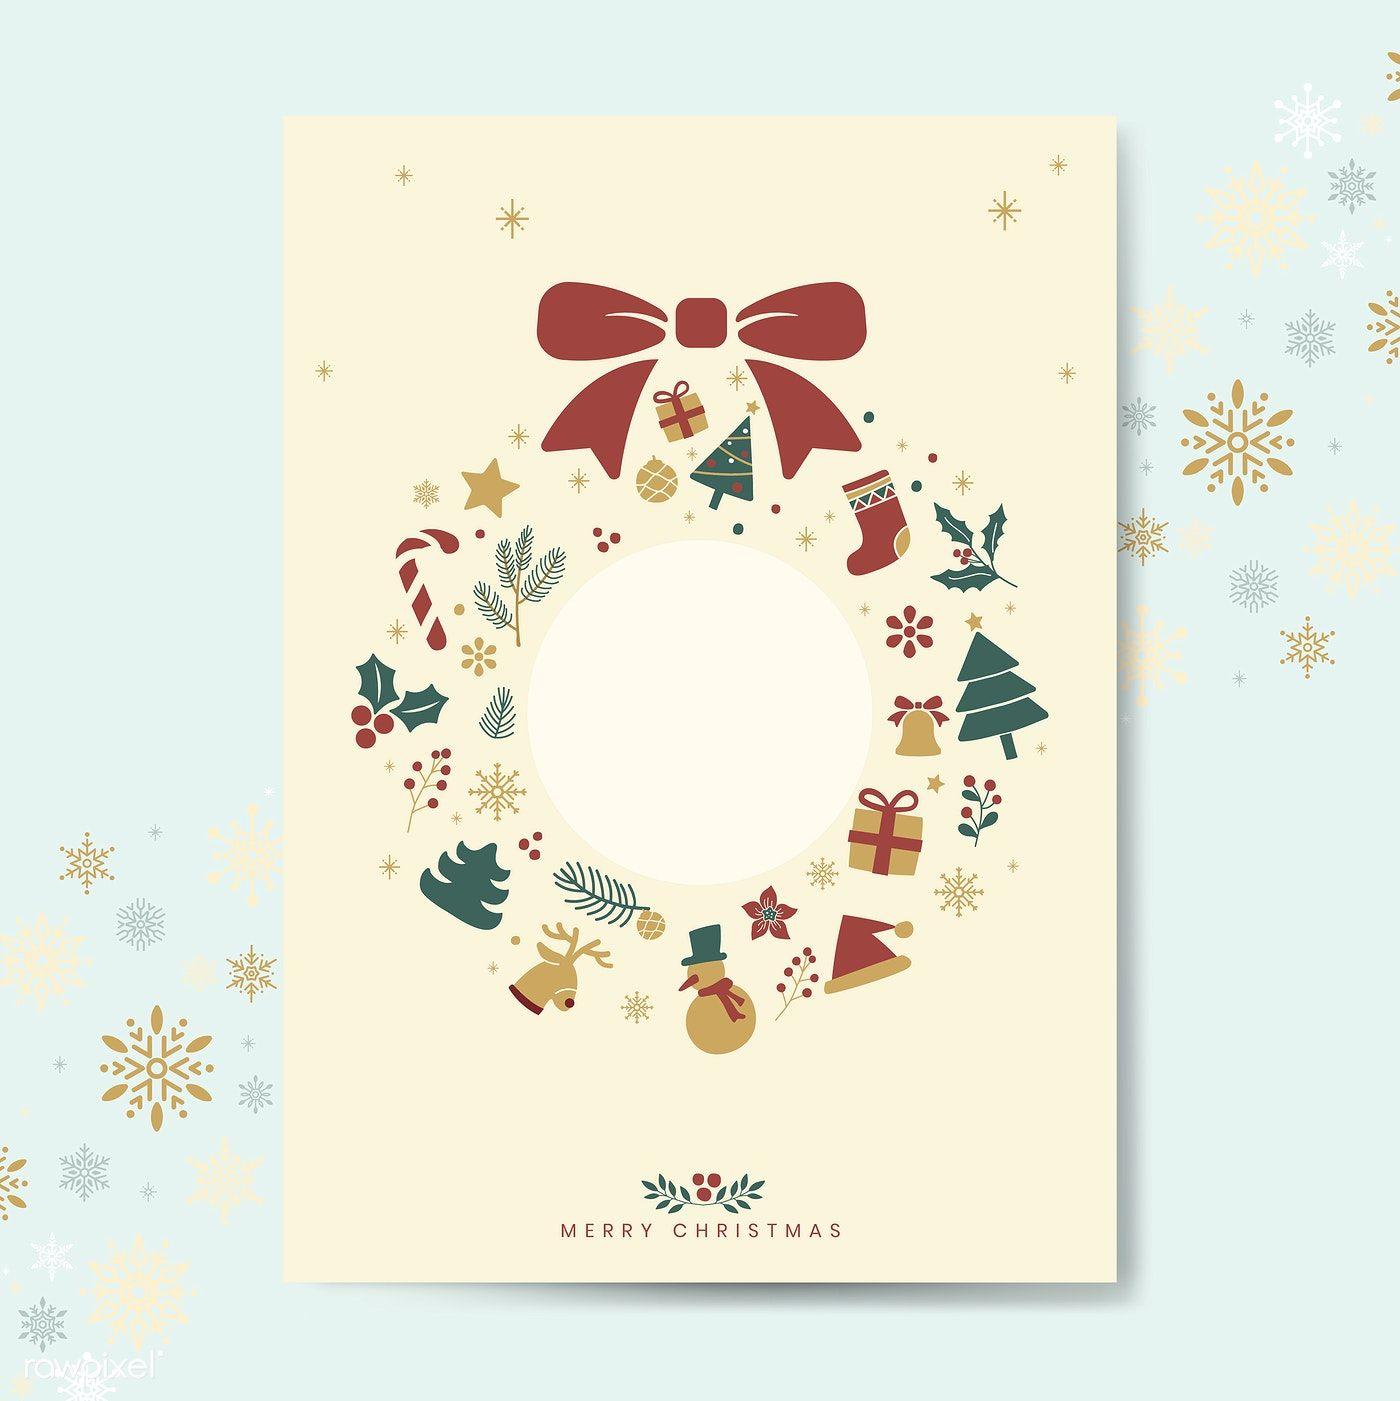 Christmas Greeting Card Mockup Vector Free Image By Rawpixel Com Christmas Greeting Card Template Free Christmas Greeting Cards Christmas Greetings